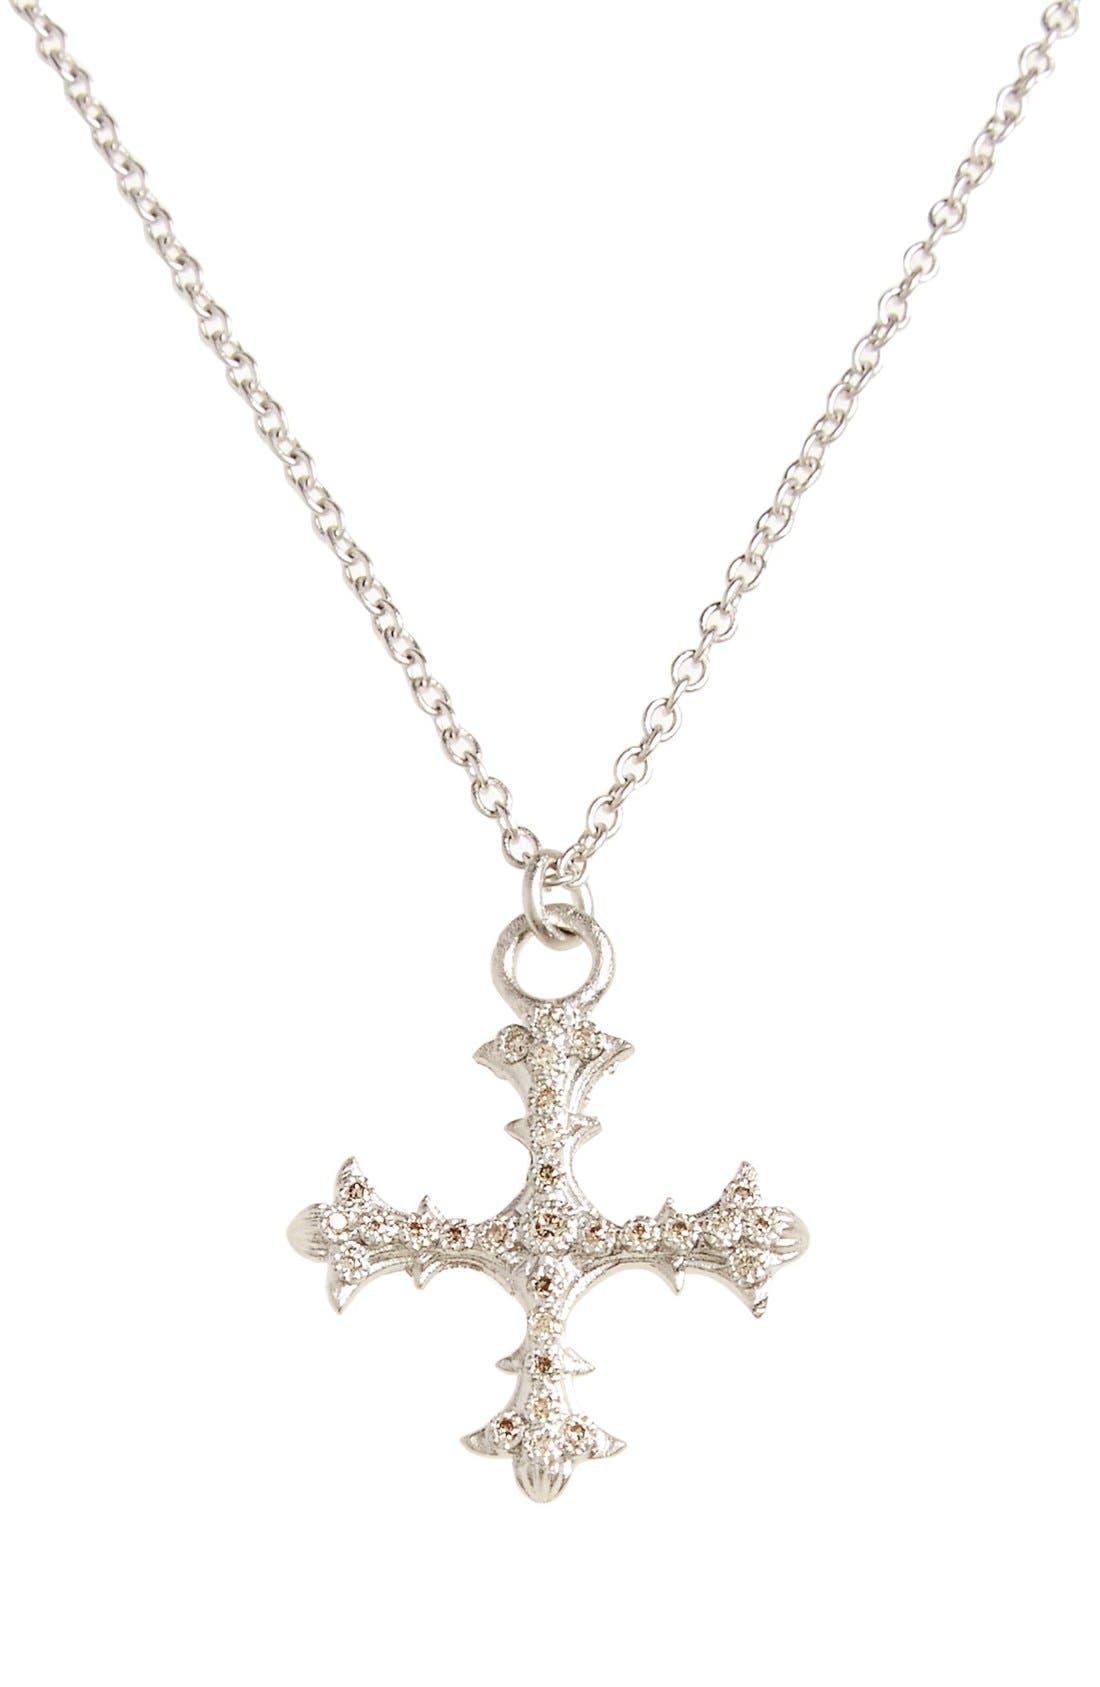 Old World Diamond Cross Pendant Necklace,                             Main thumbnail 1, color,                             SILVER